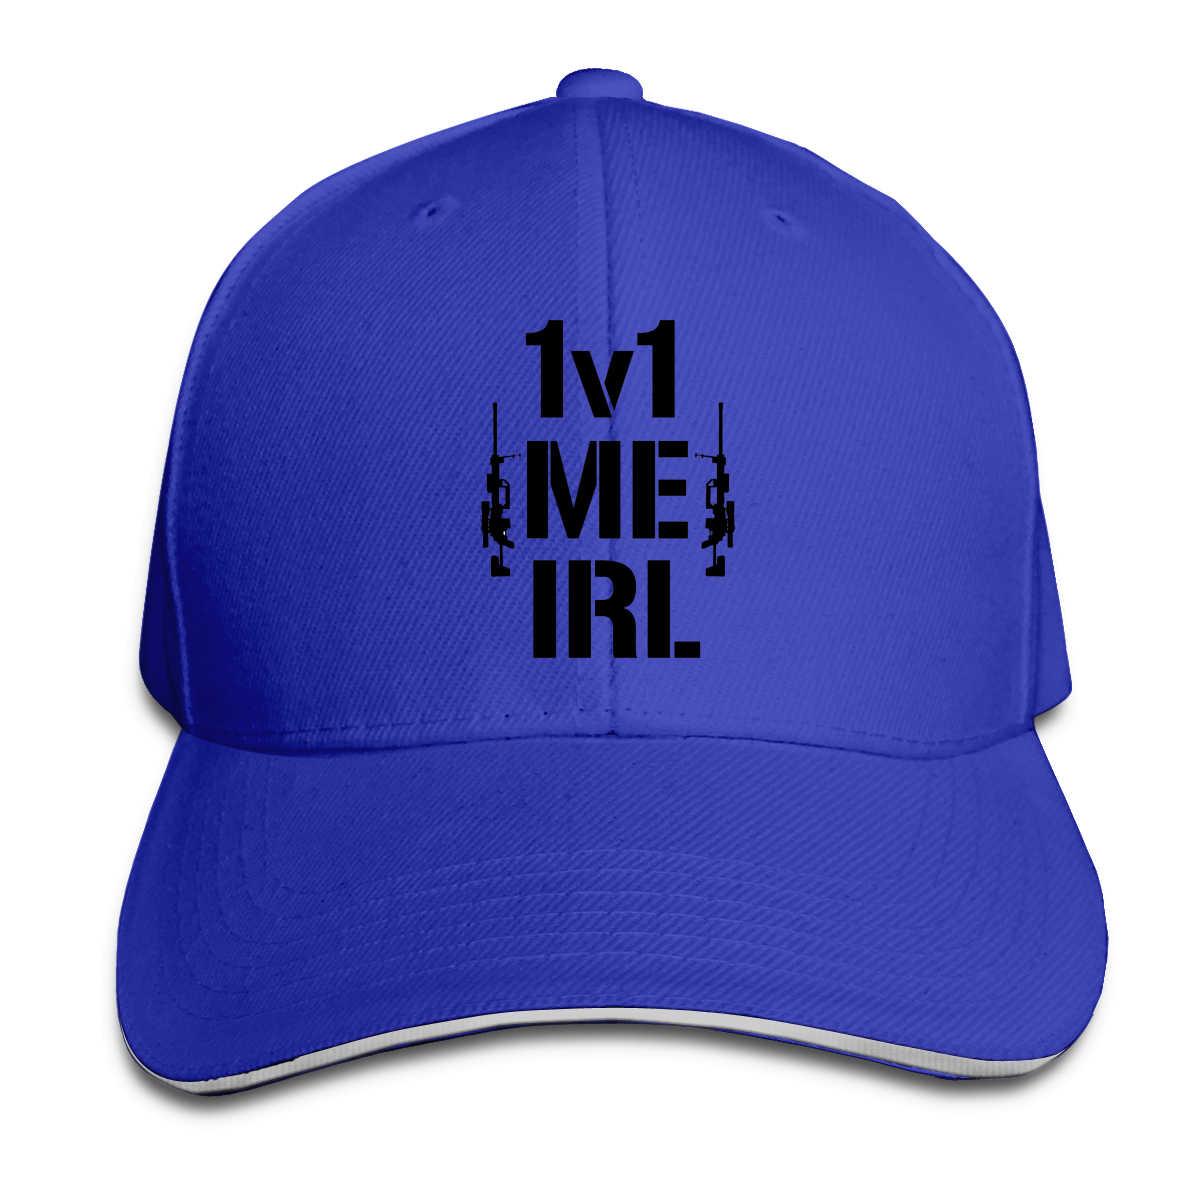 1v1 Me Irl бейсболка Мужская кепка s цвета женская мужская летняя кепка Snapback call of duty s